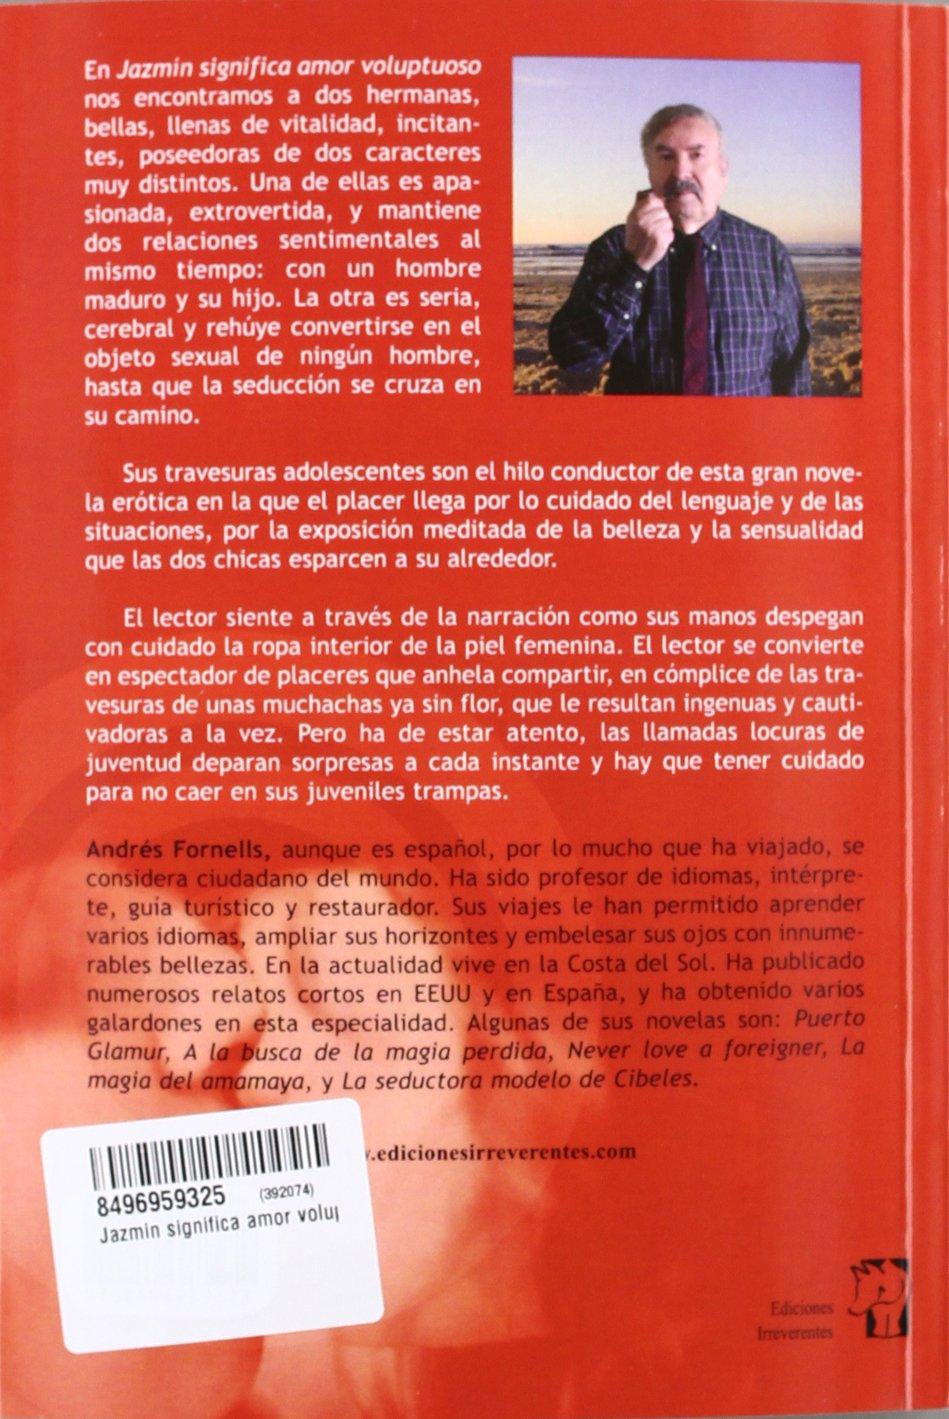 Jazmín Significa Amor Voluptuoso (Spanish Edition): Andrés Fornells: 9788496959323: Amazon.com: Books